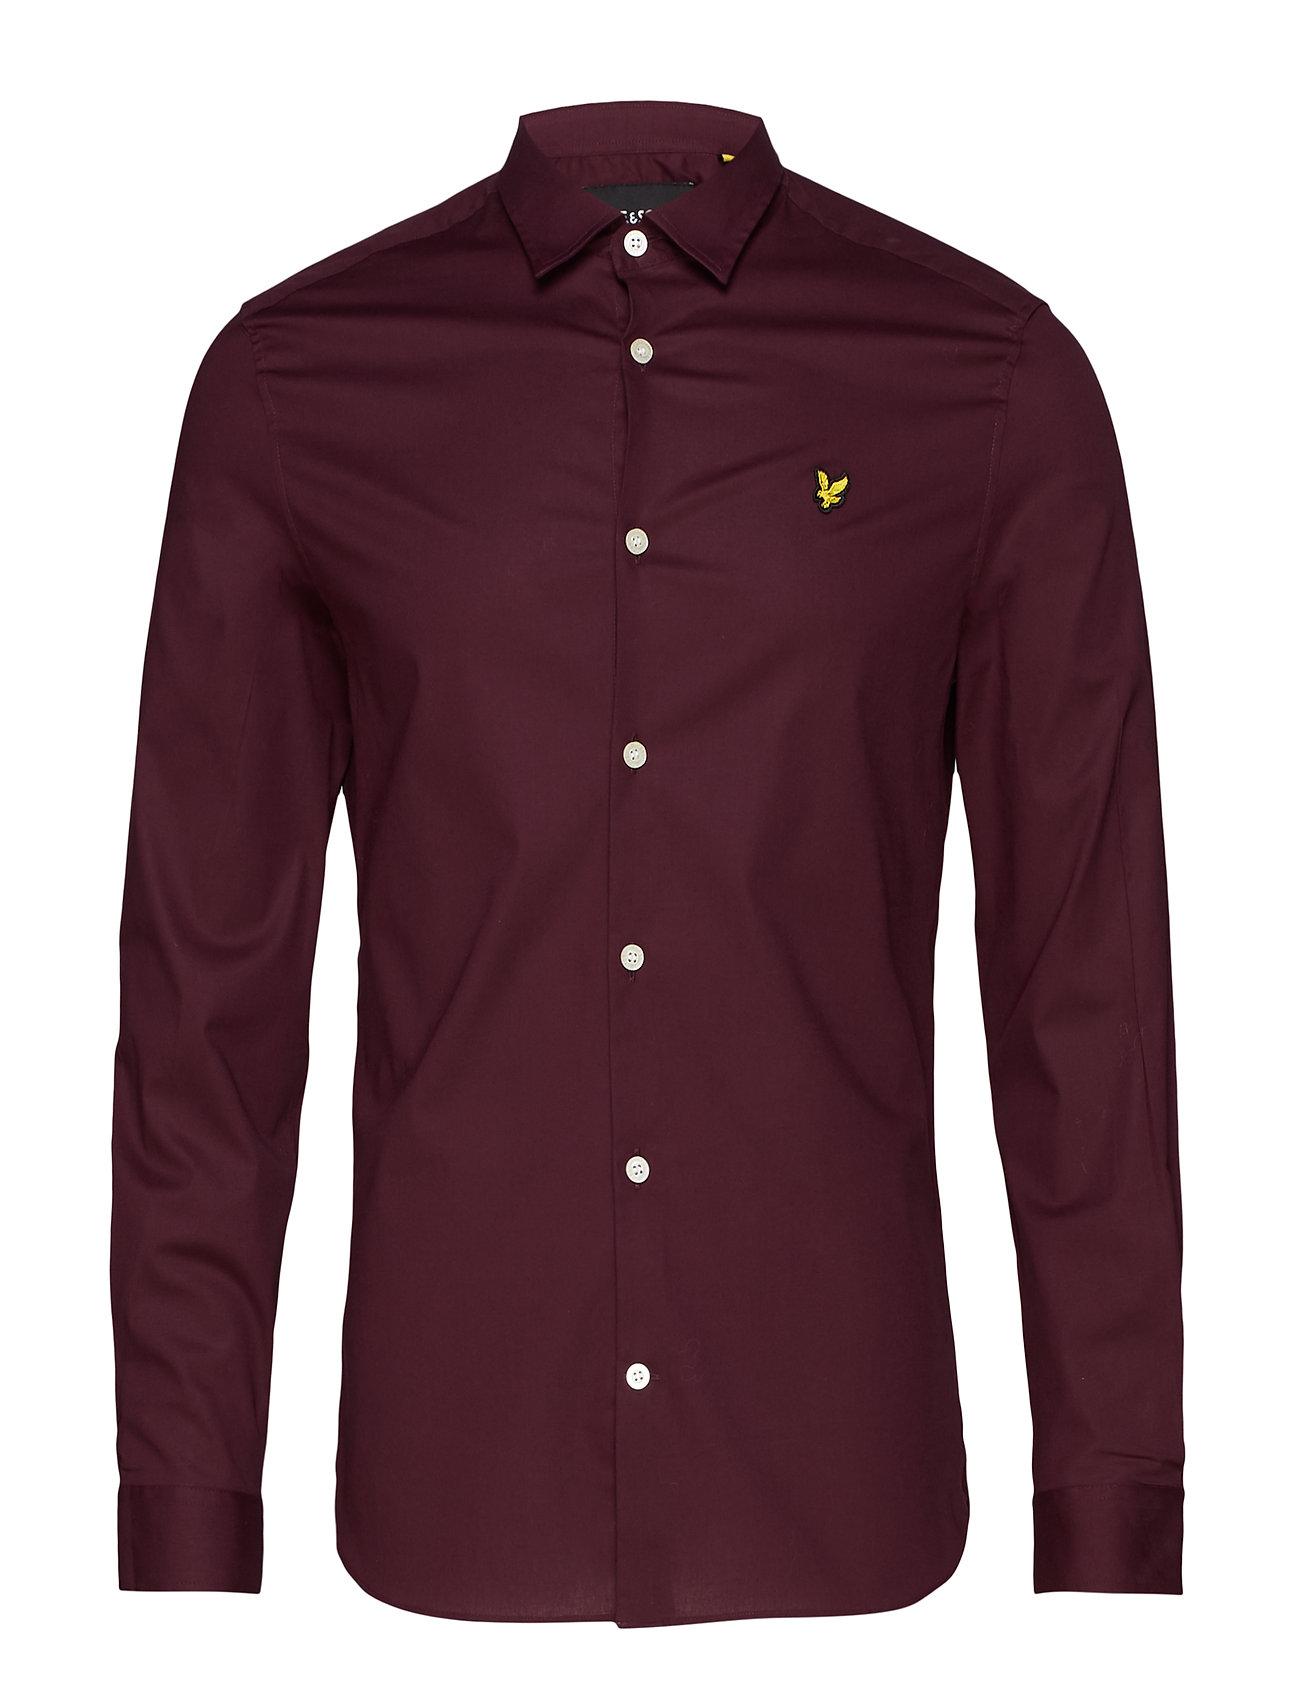 Lyle & Scott LS Slim Fit Poplin Shirt - BURGUNDY